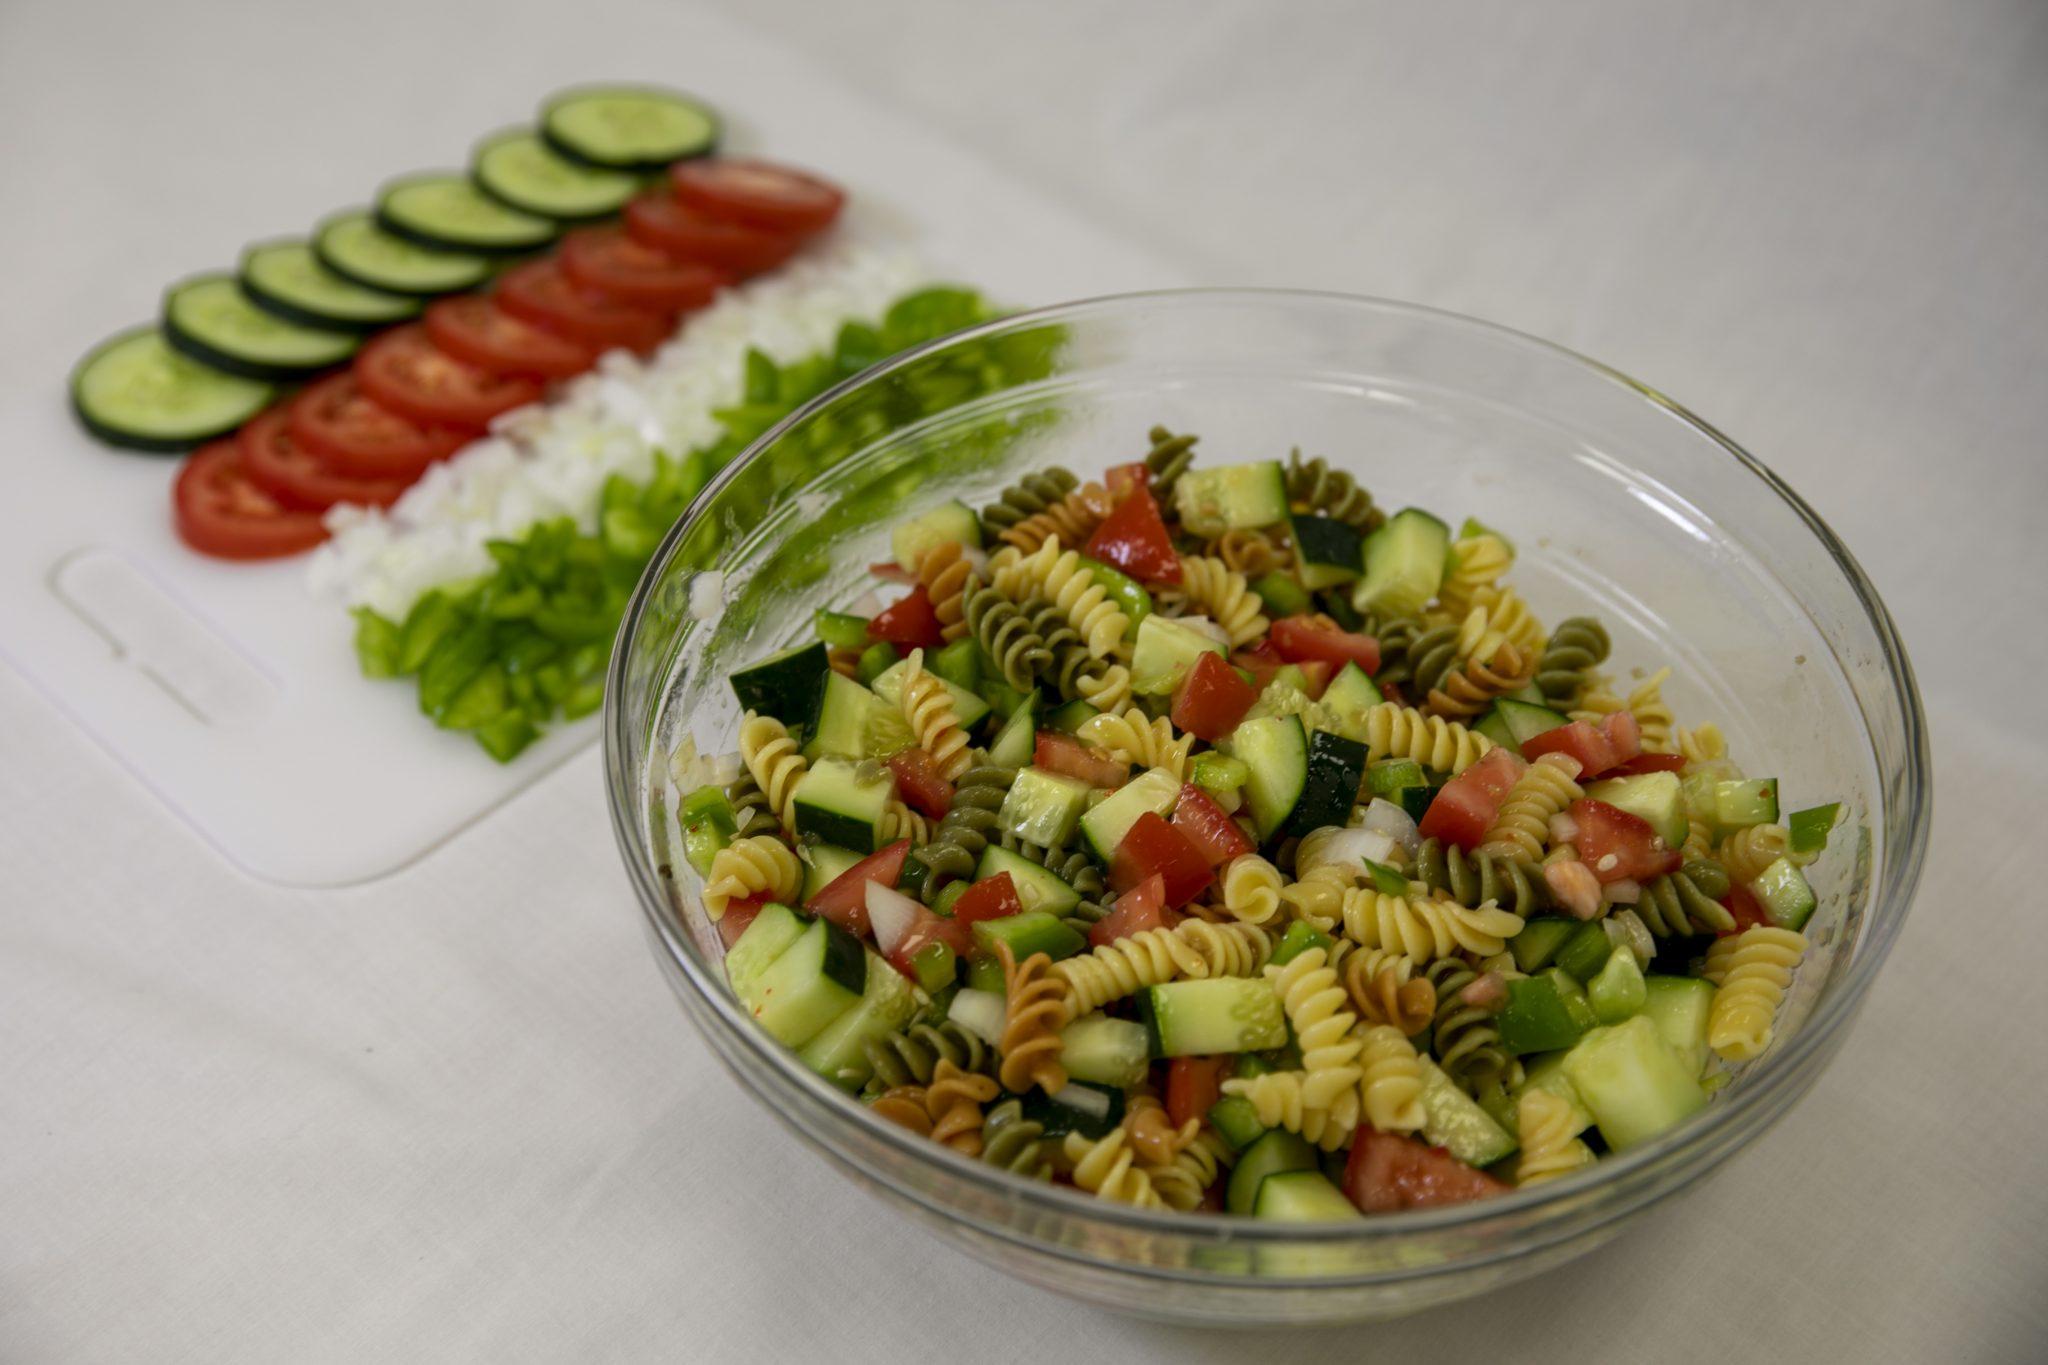 Picnic Pasta Salad